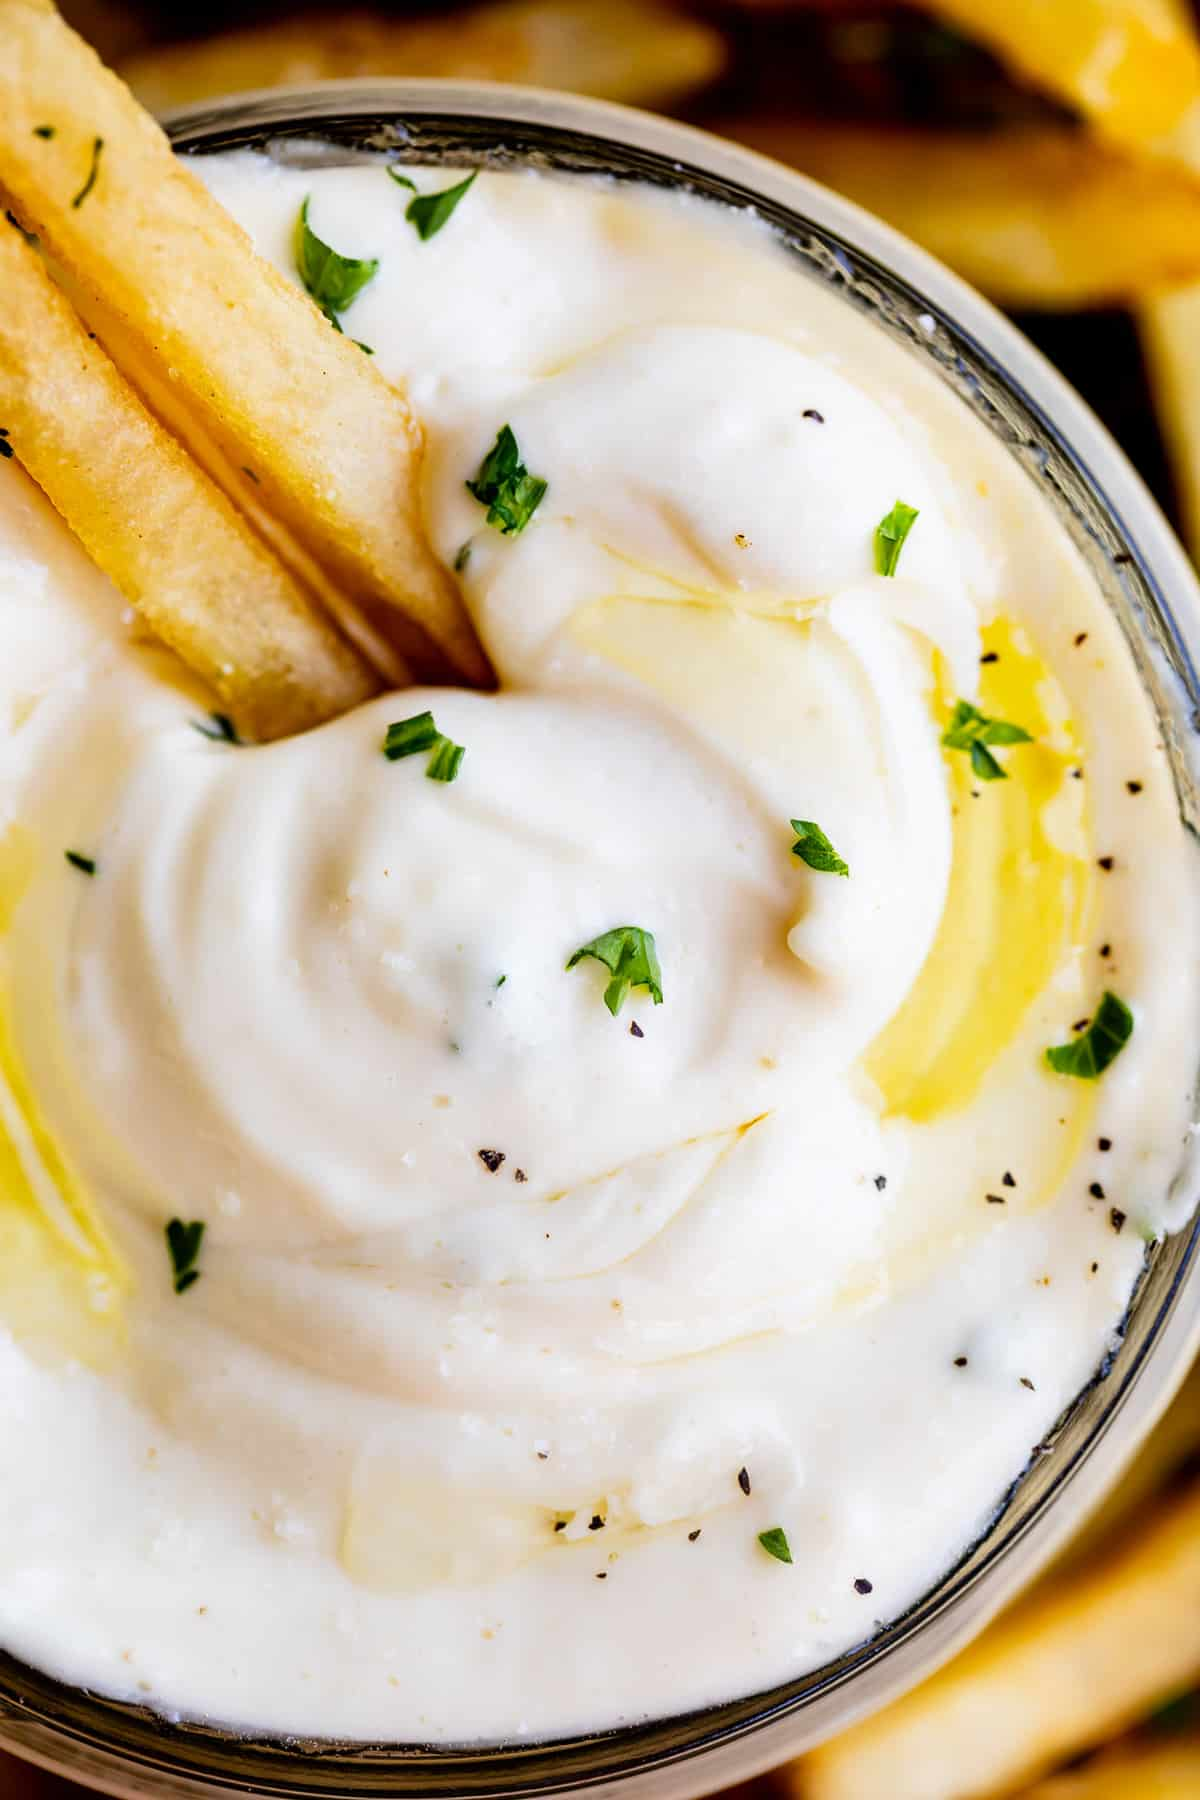 Garlic Aioli Recipe (Classic and Cheater Versions)